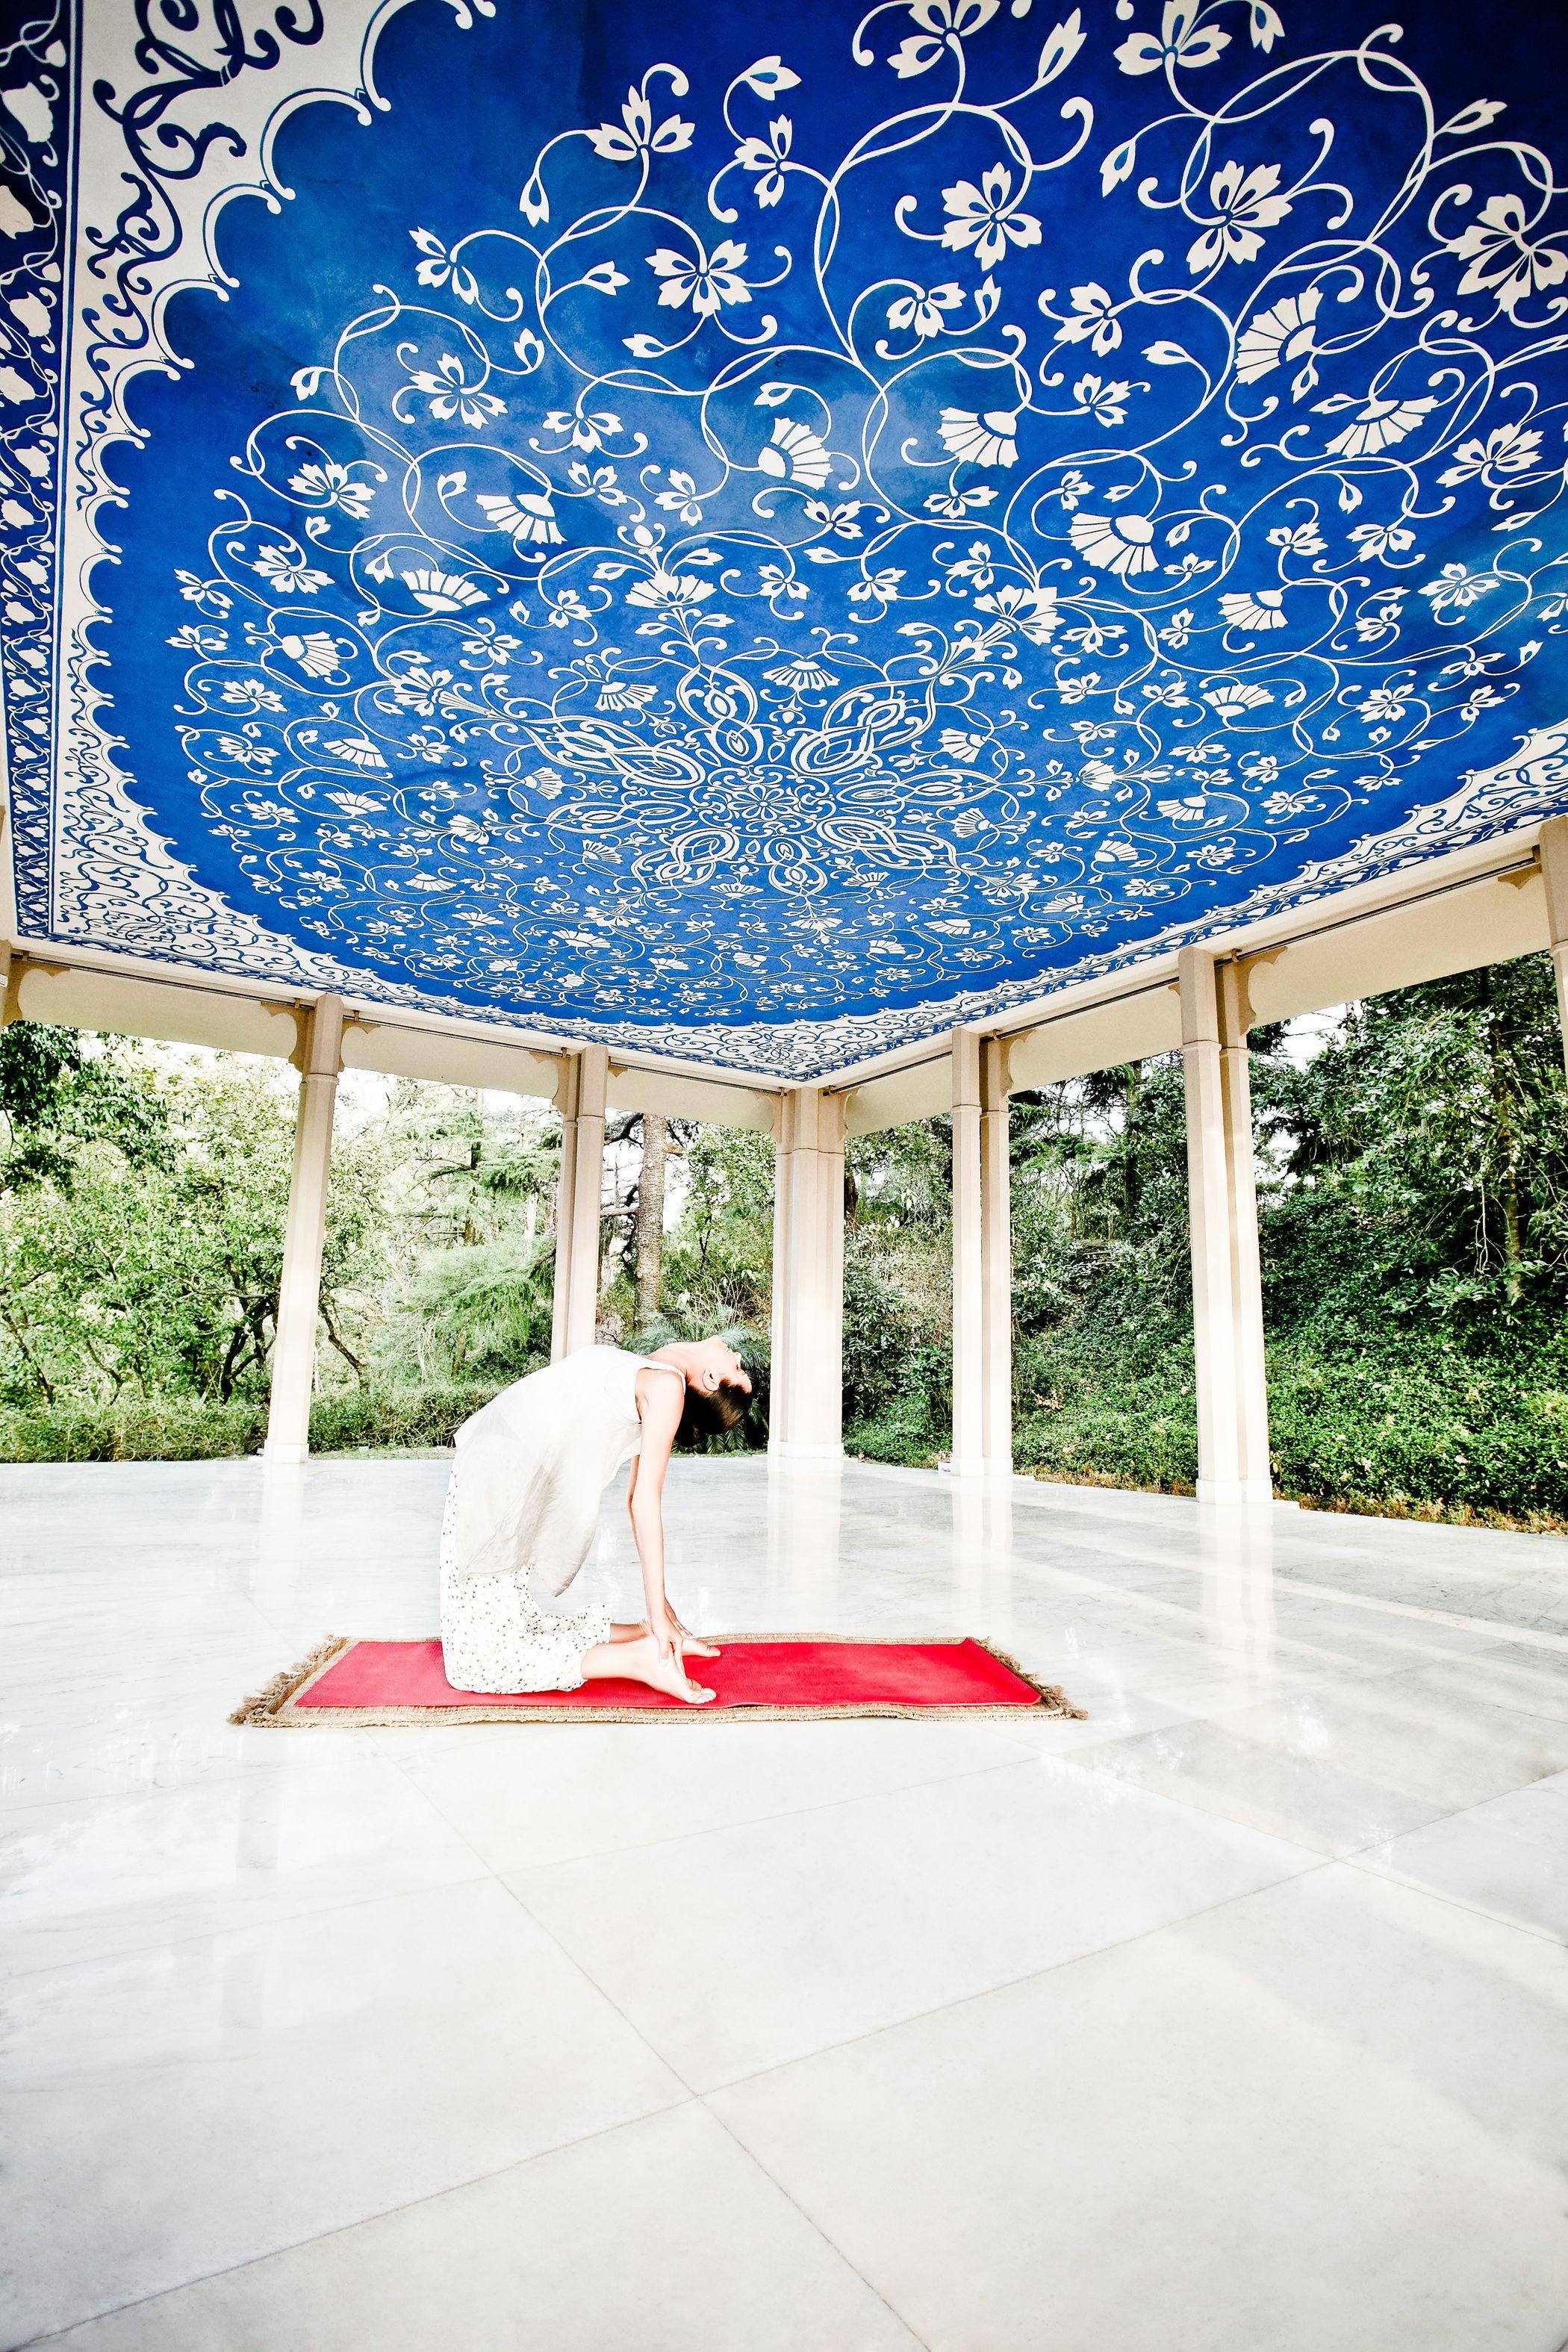 Ananda Spa Resorts Himalayas India Swirled In The Sacred Mists